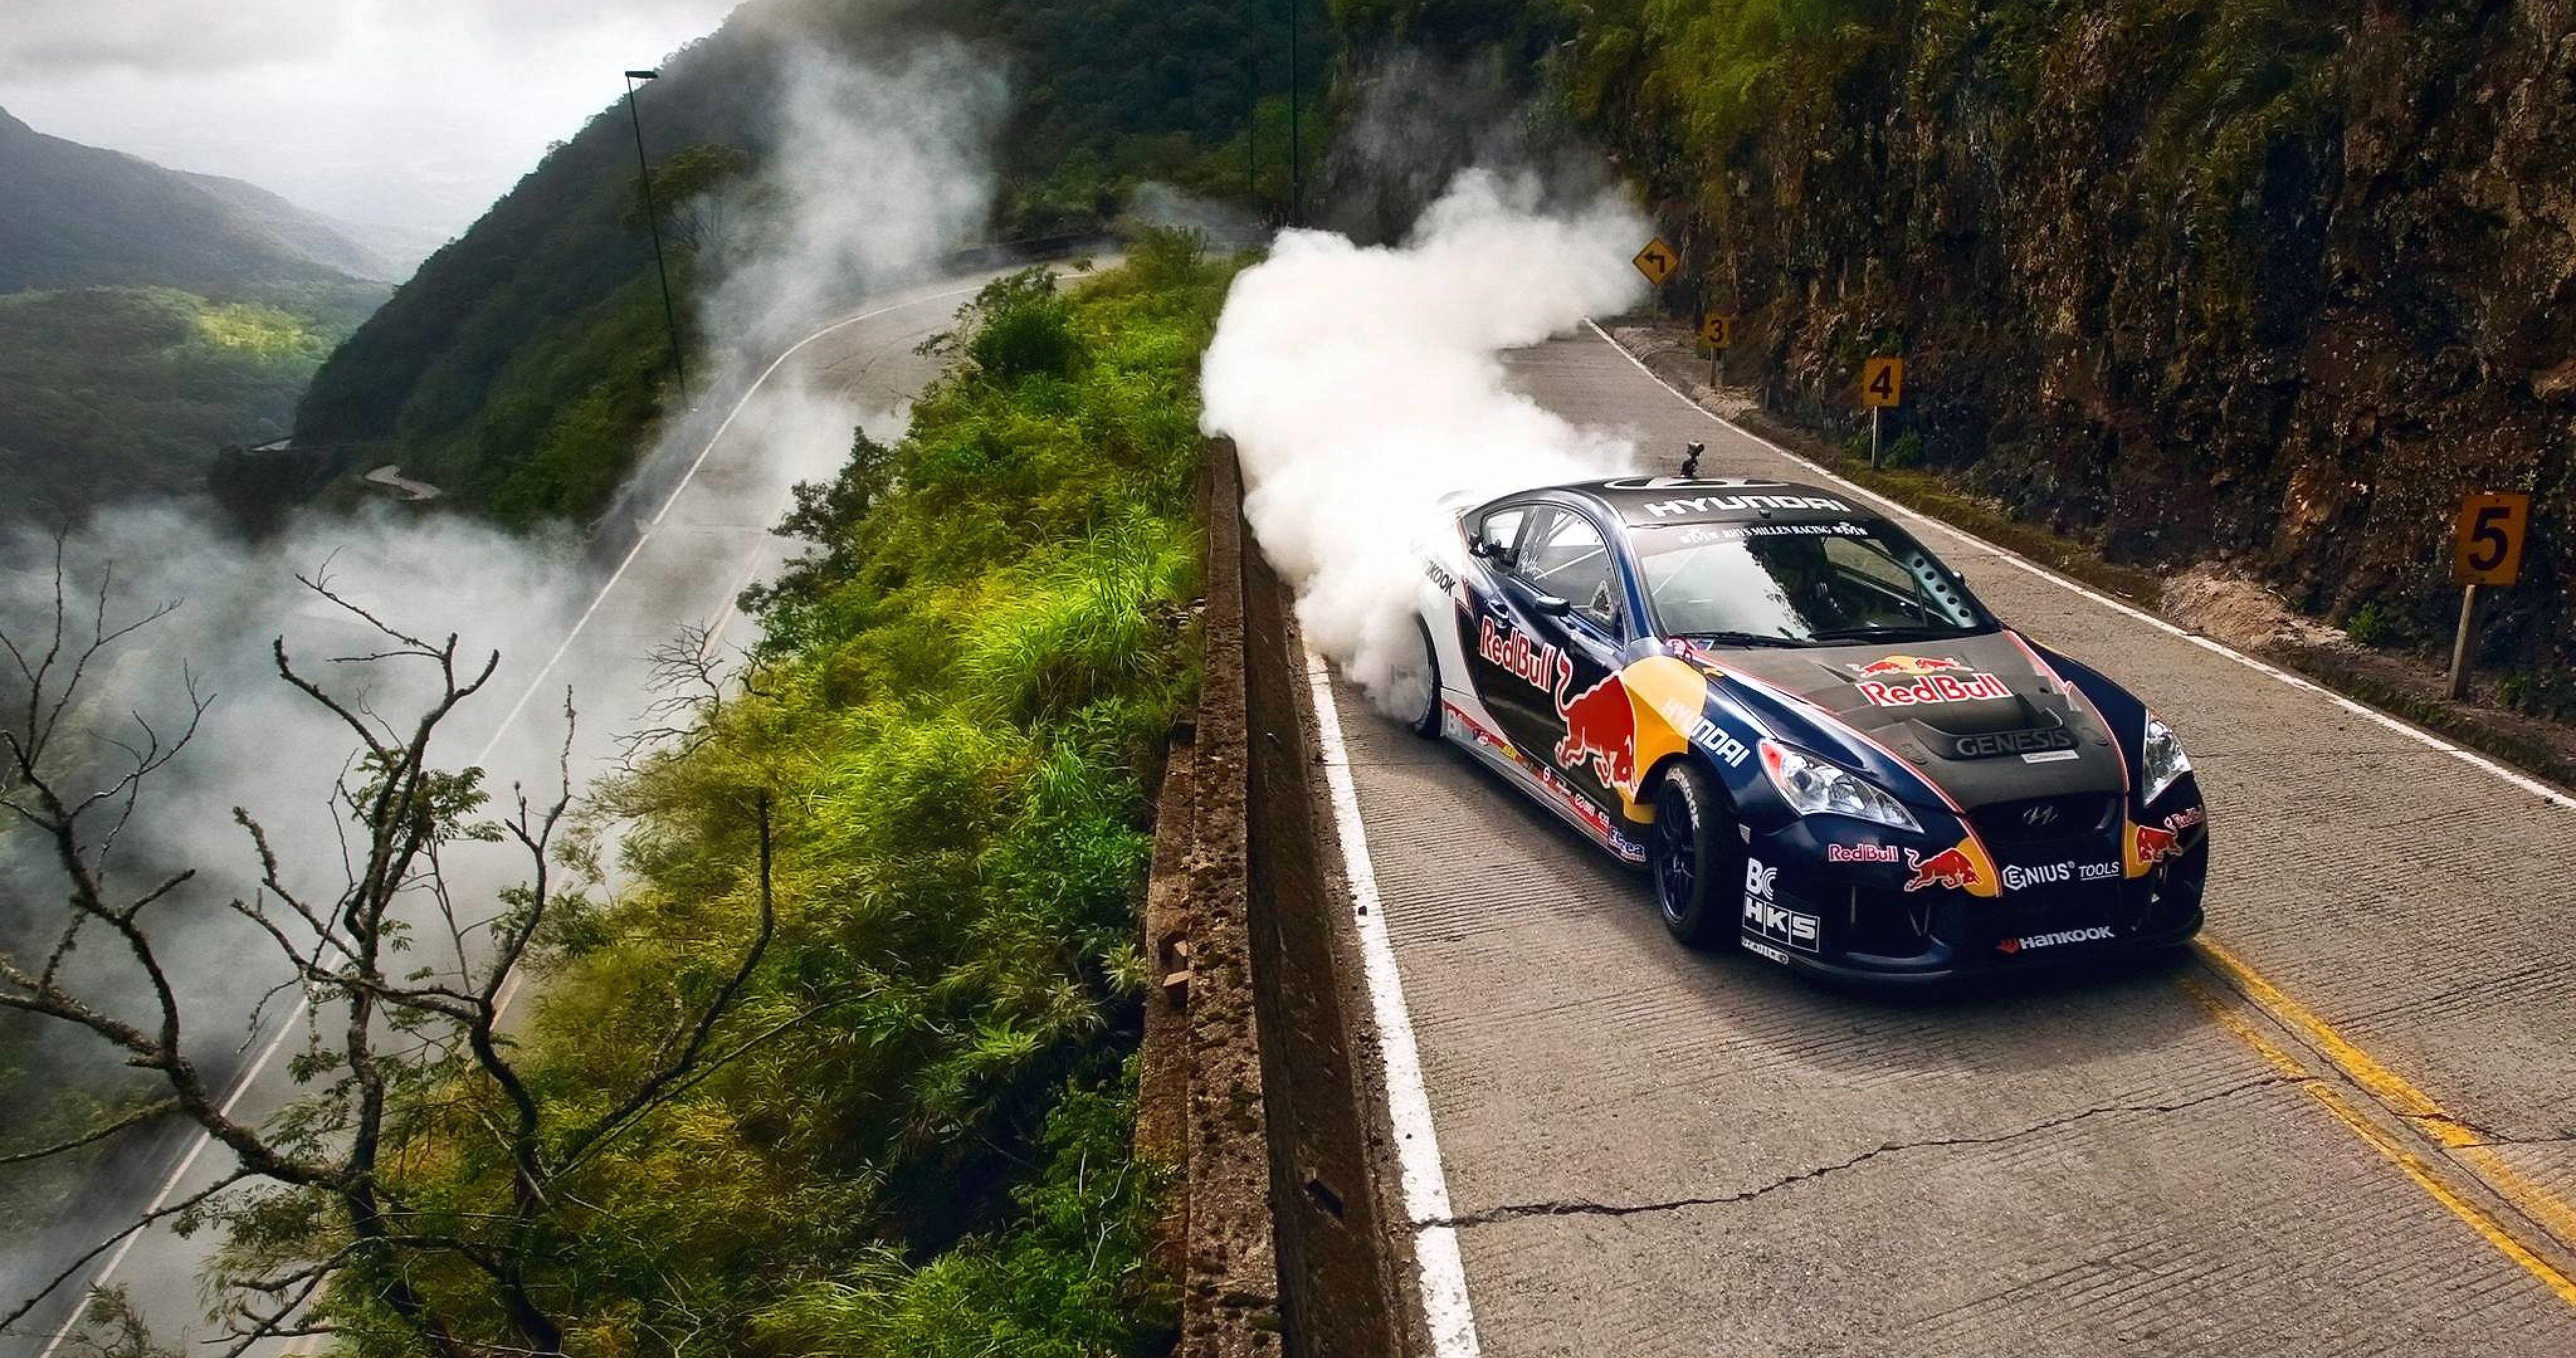 Red bull drifting extreme 4k ultra hd wallpaper - Drift car wallpaper ...